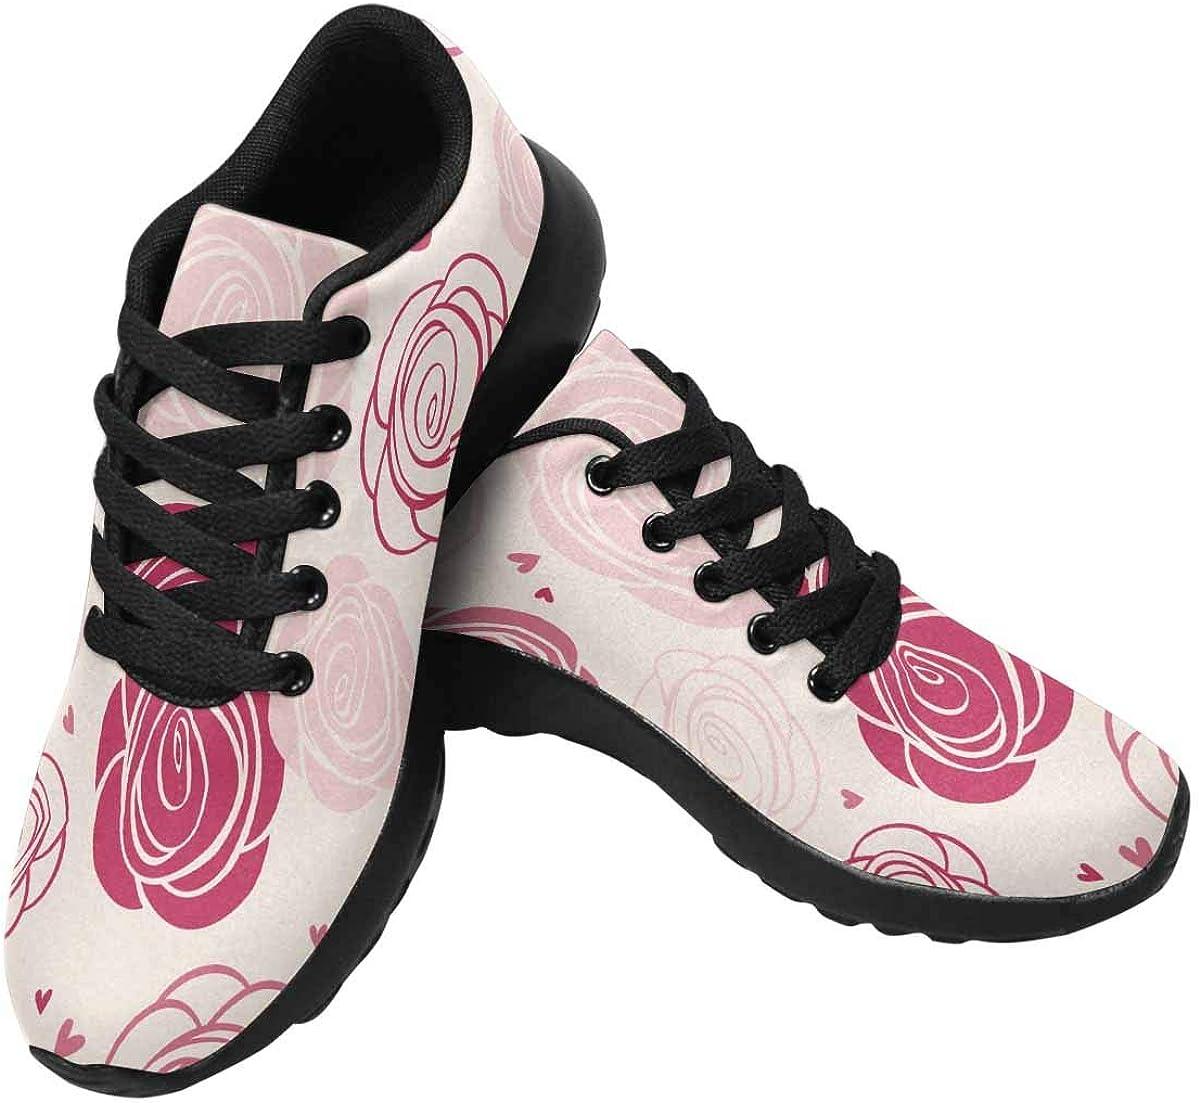 InterestPrint Rose Pattern Womens Jogging Sneakers Outdoor Sport Cross Training Shoes